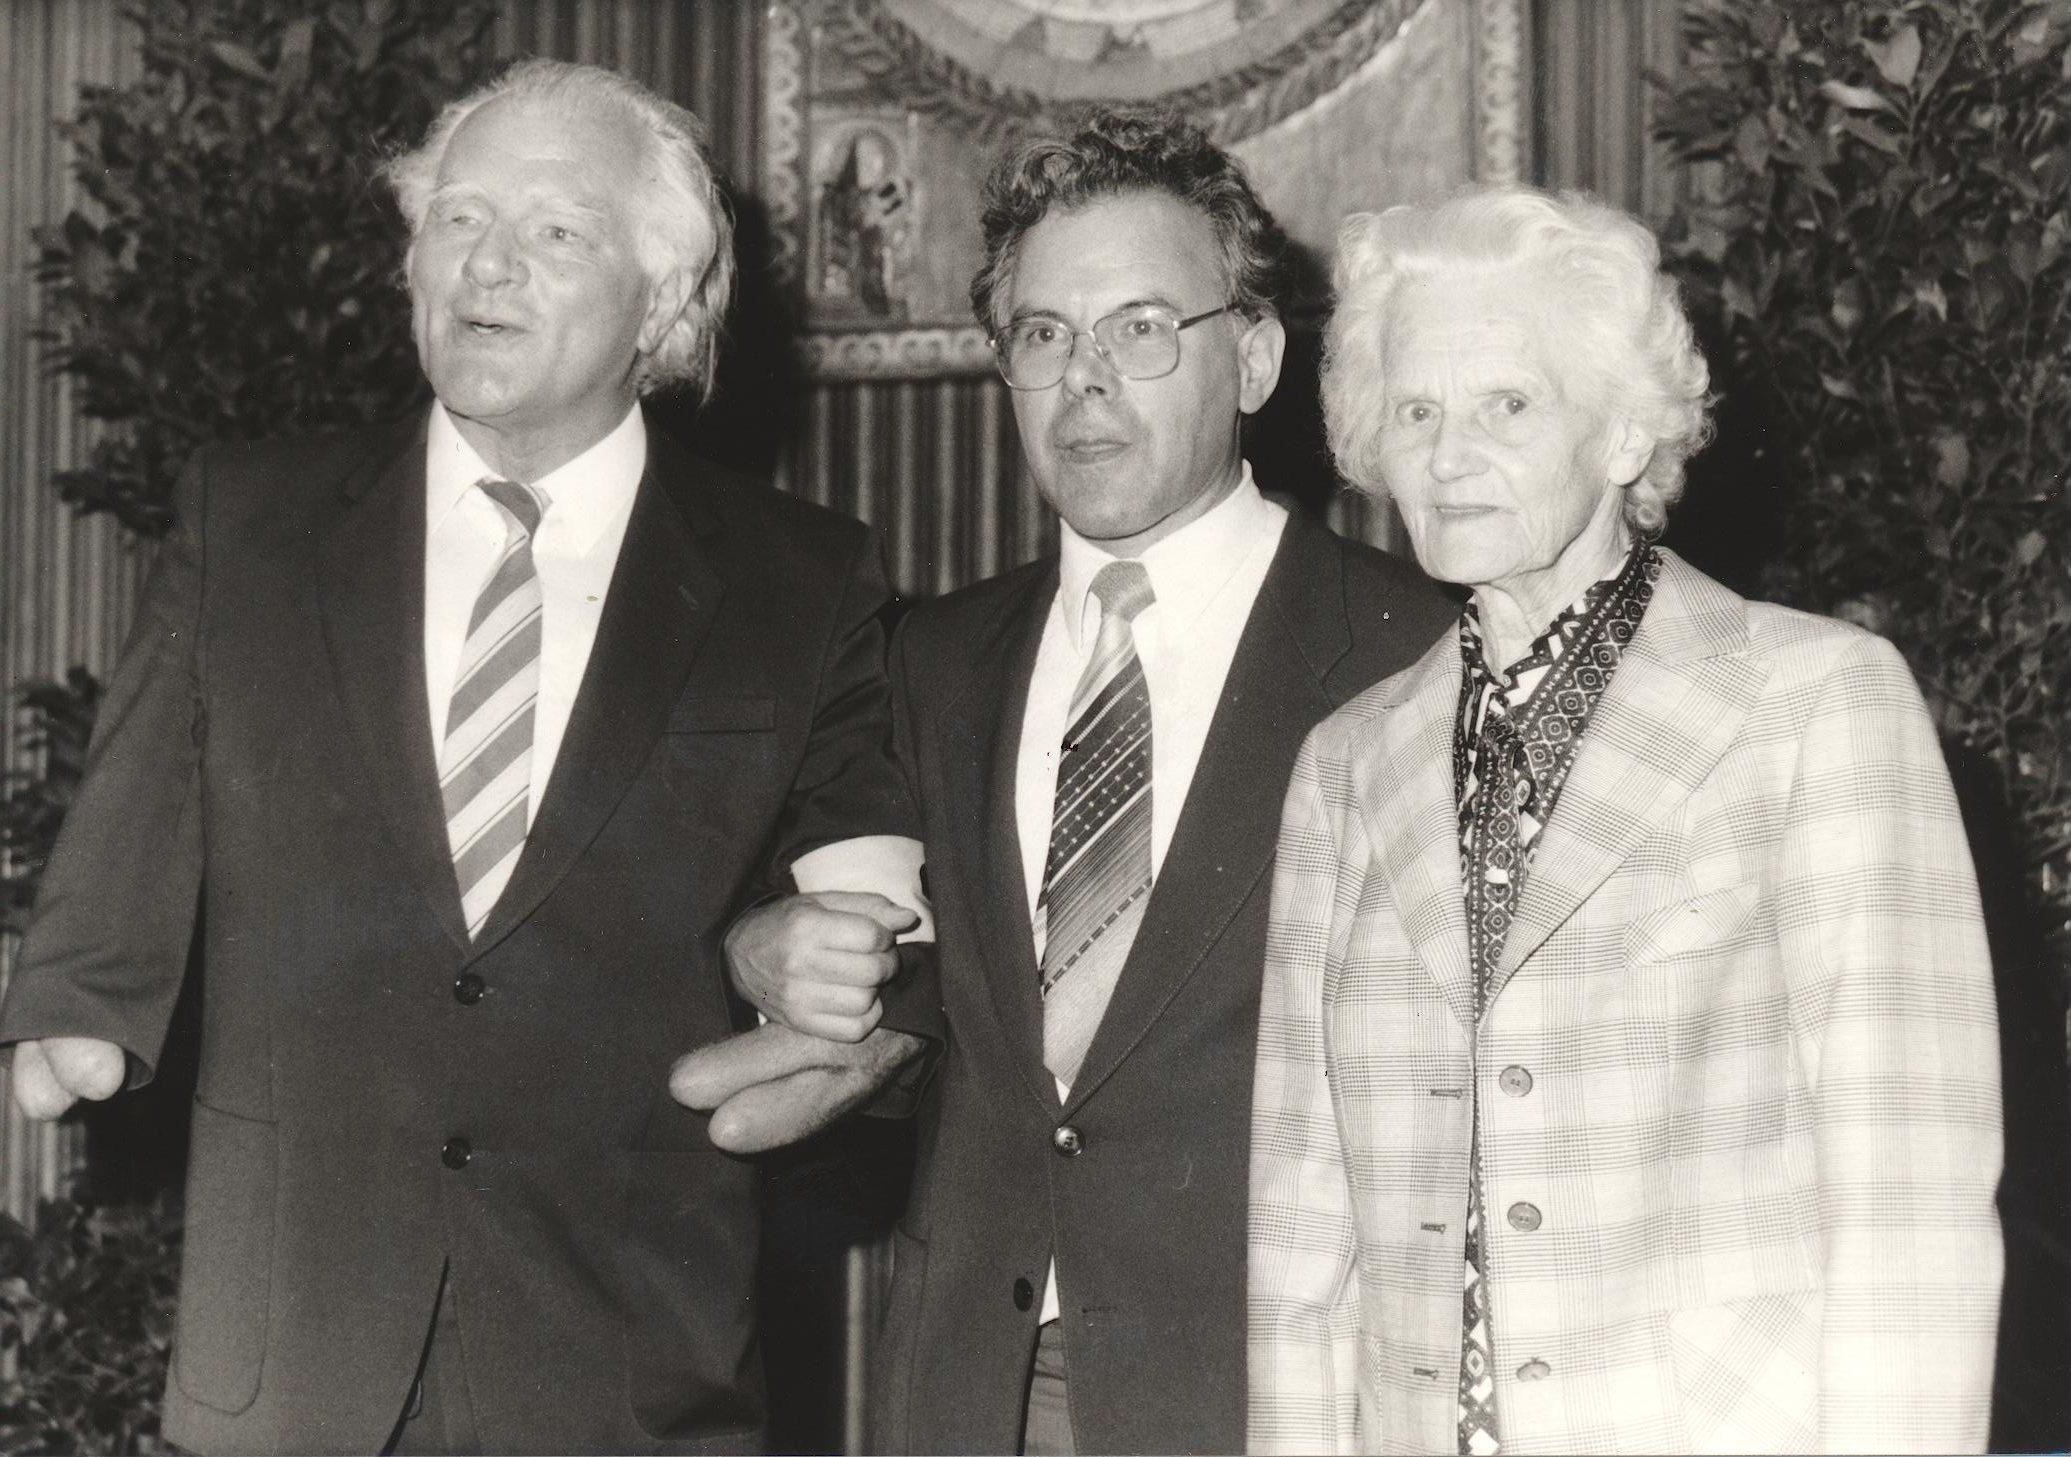 VIII. Internat. Imago Mundi-Kongress 1980, Innsbruck, Dipl.-Phys. Burkhard Heim, Prof. DDr. Andreas Resch, Minka Honeck